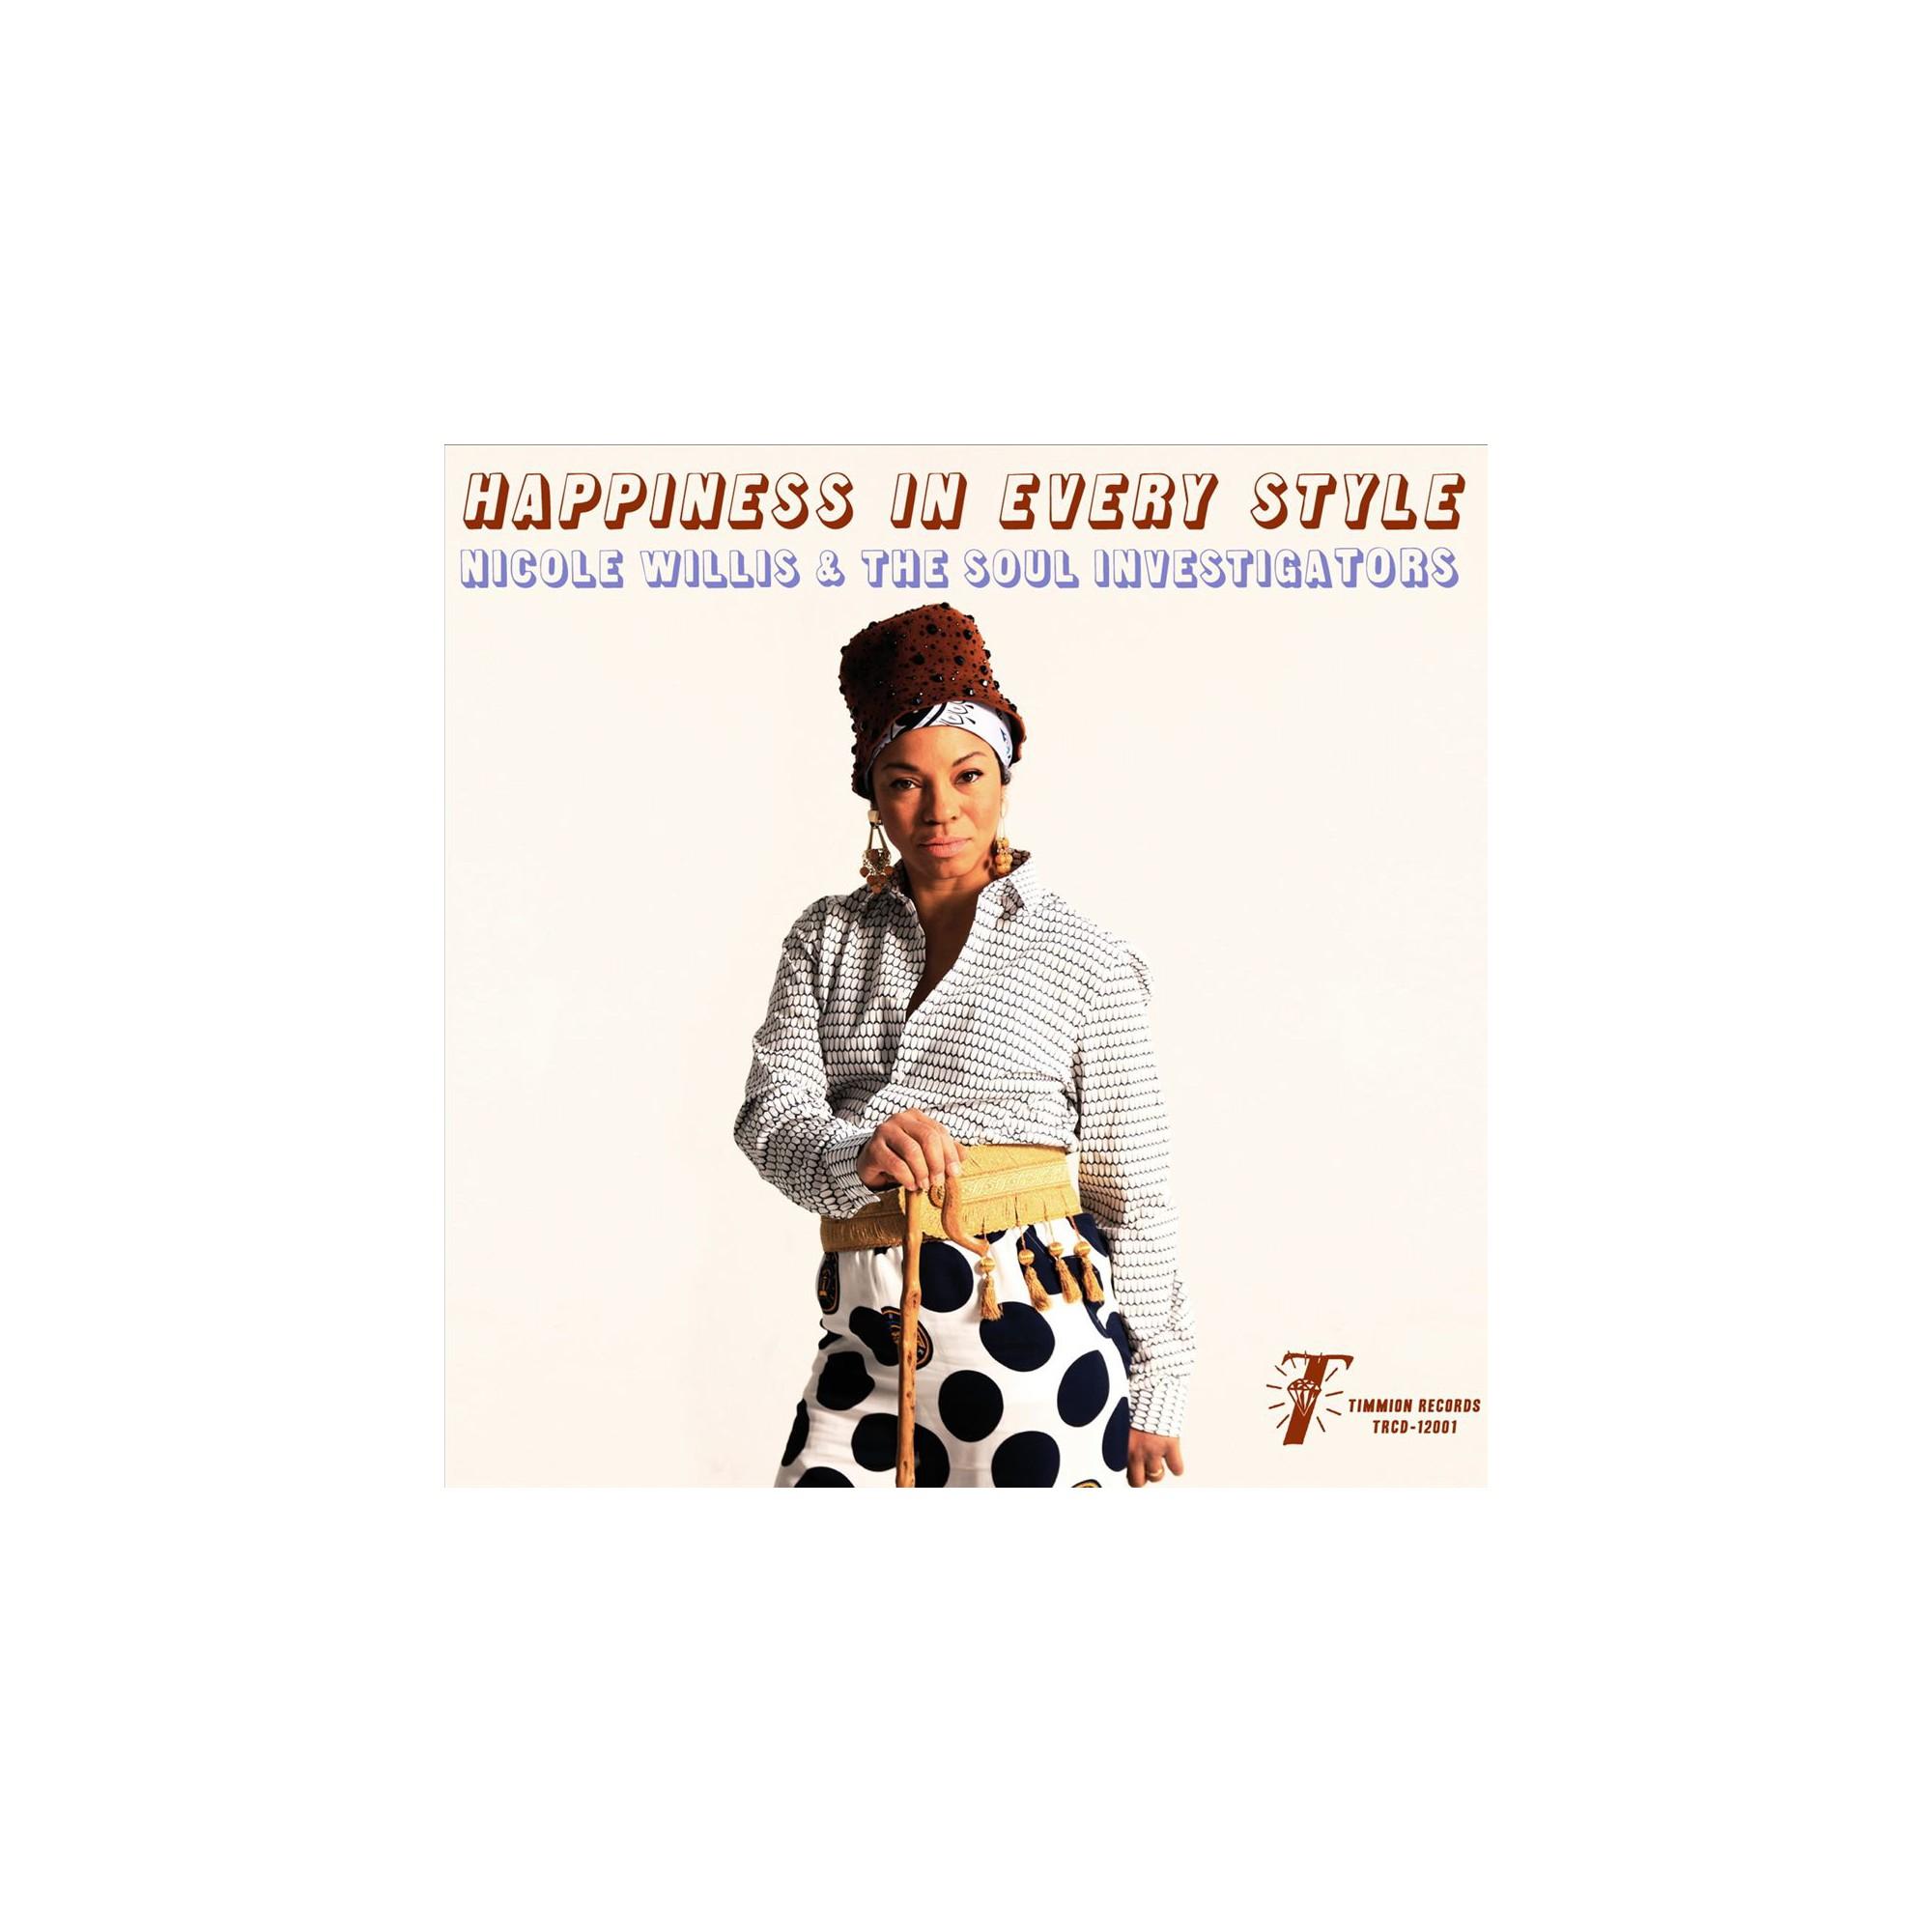 Nicole & the willis Happiness in every style (Vinyl